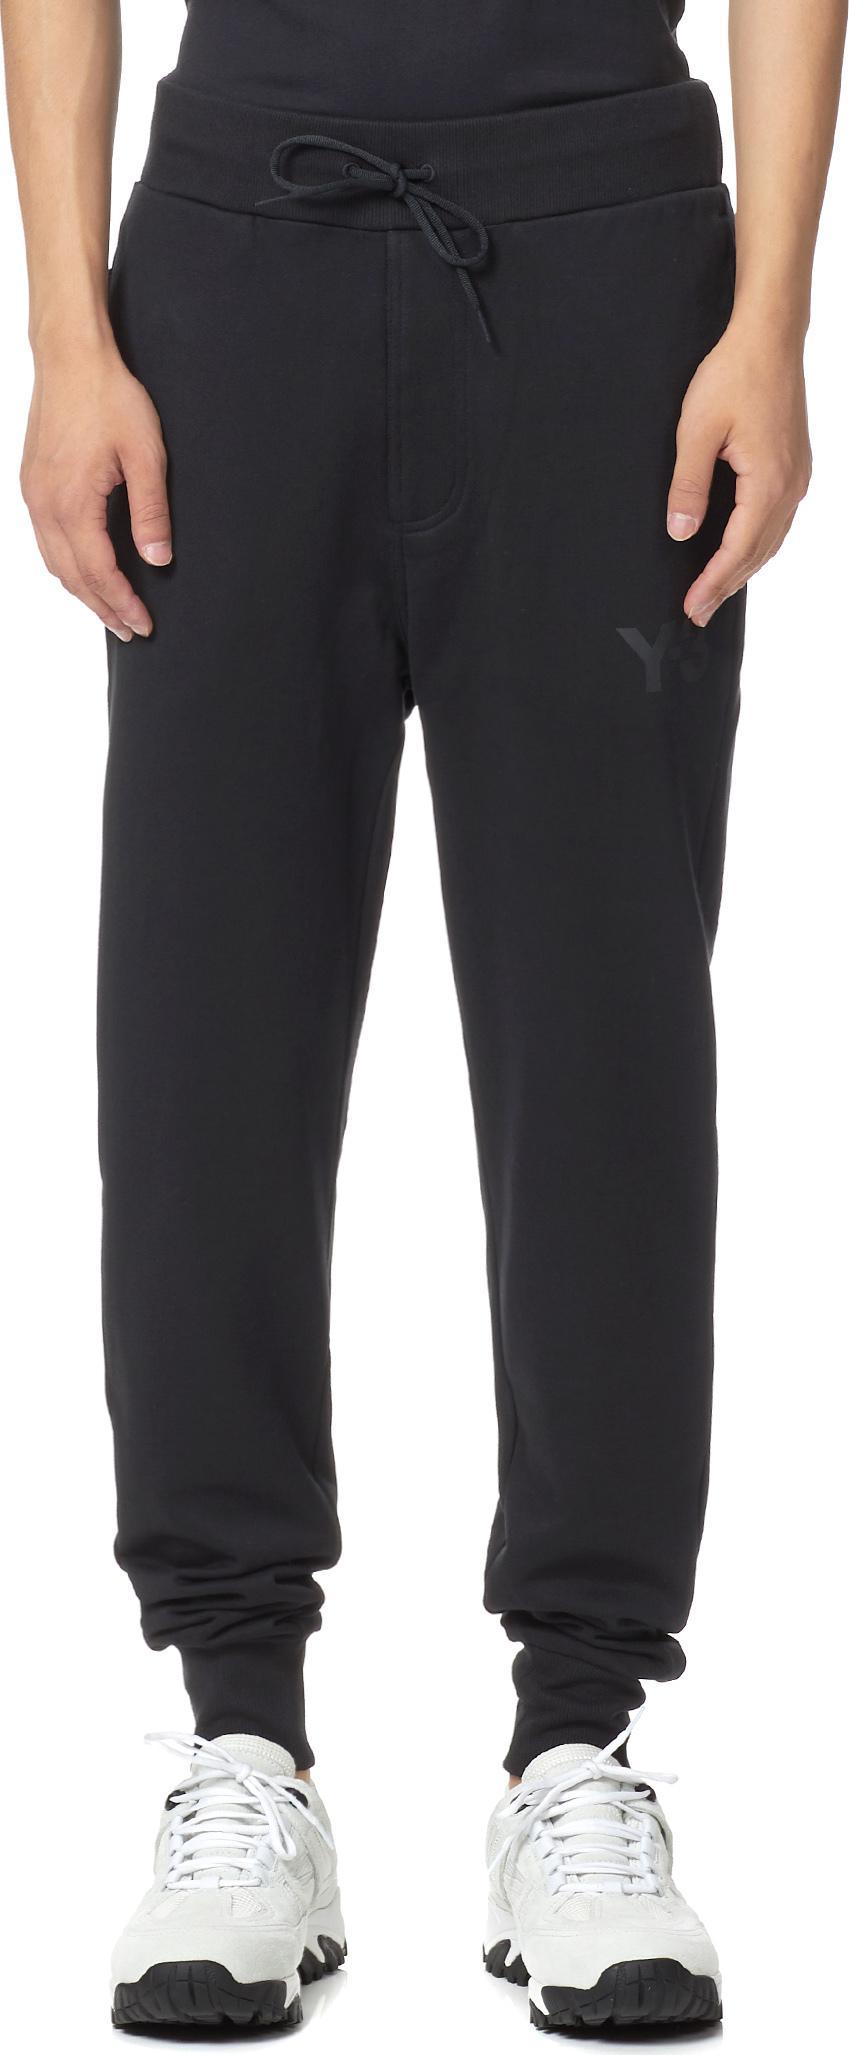 4c87d4c74e64c Lyst - Y-3 Classic Cuff Pants in Black for Men